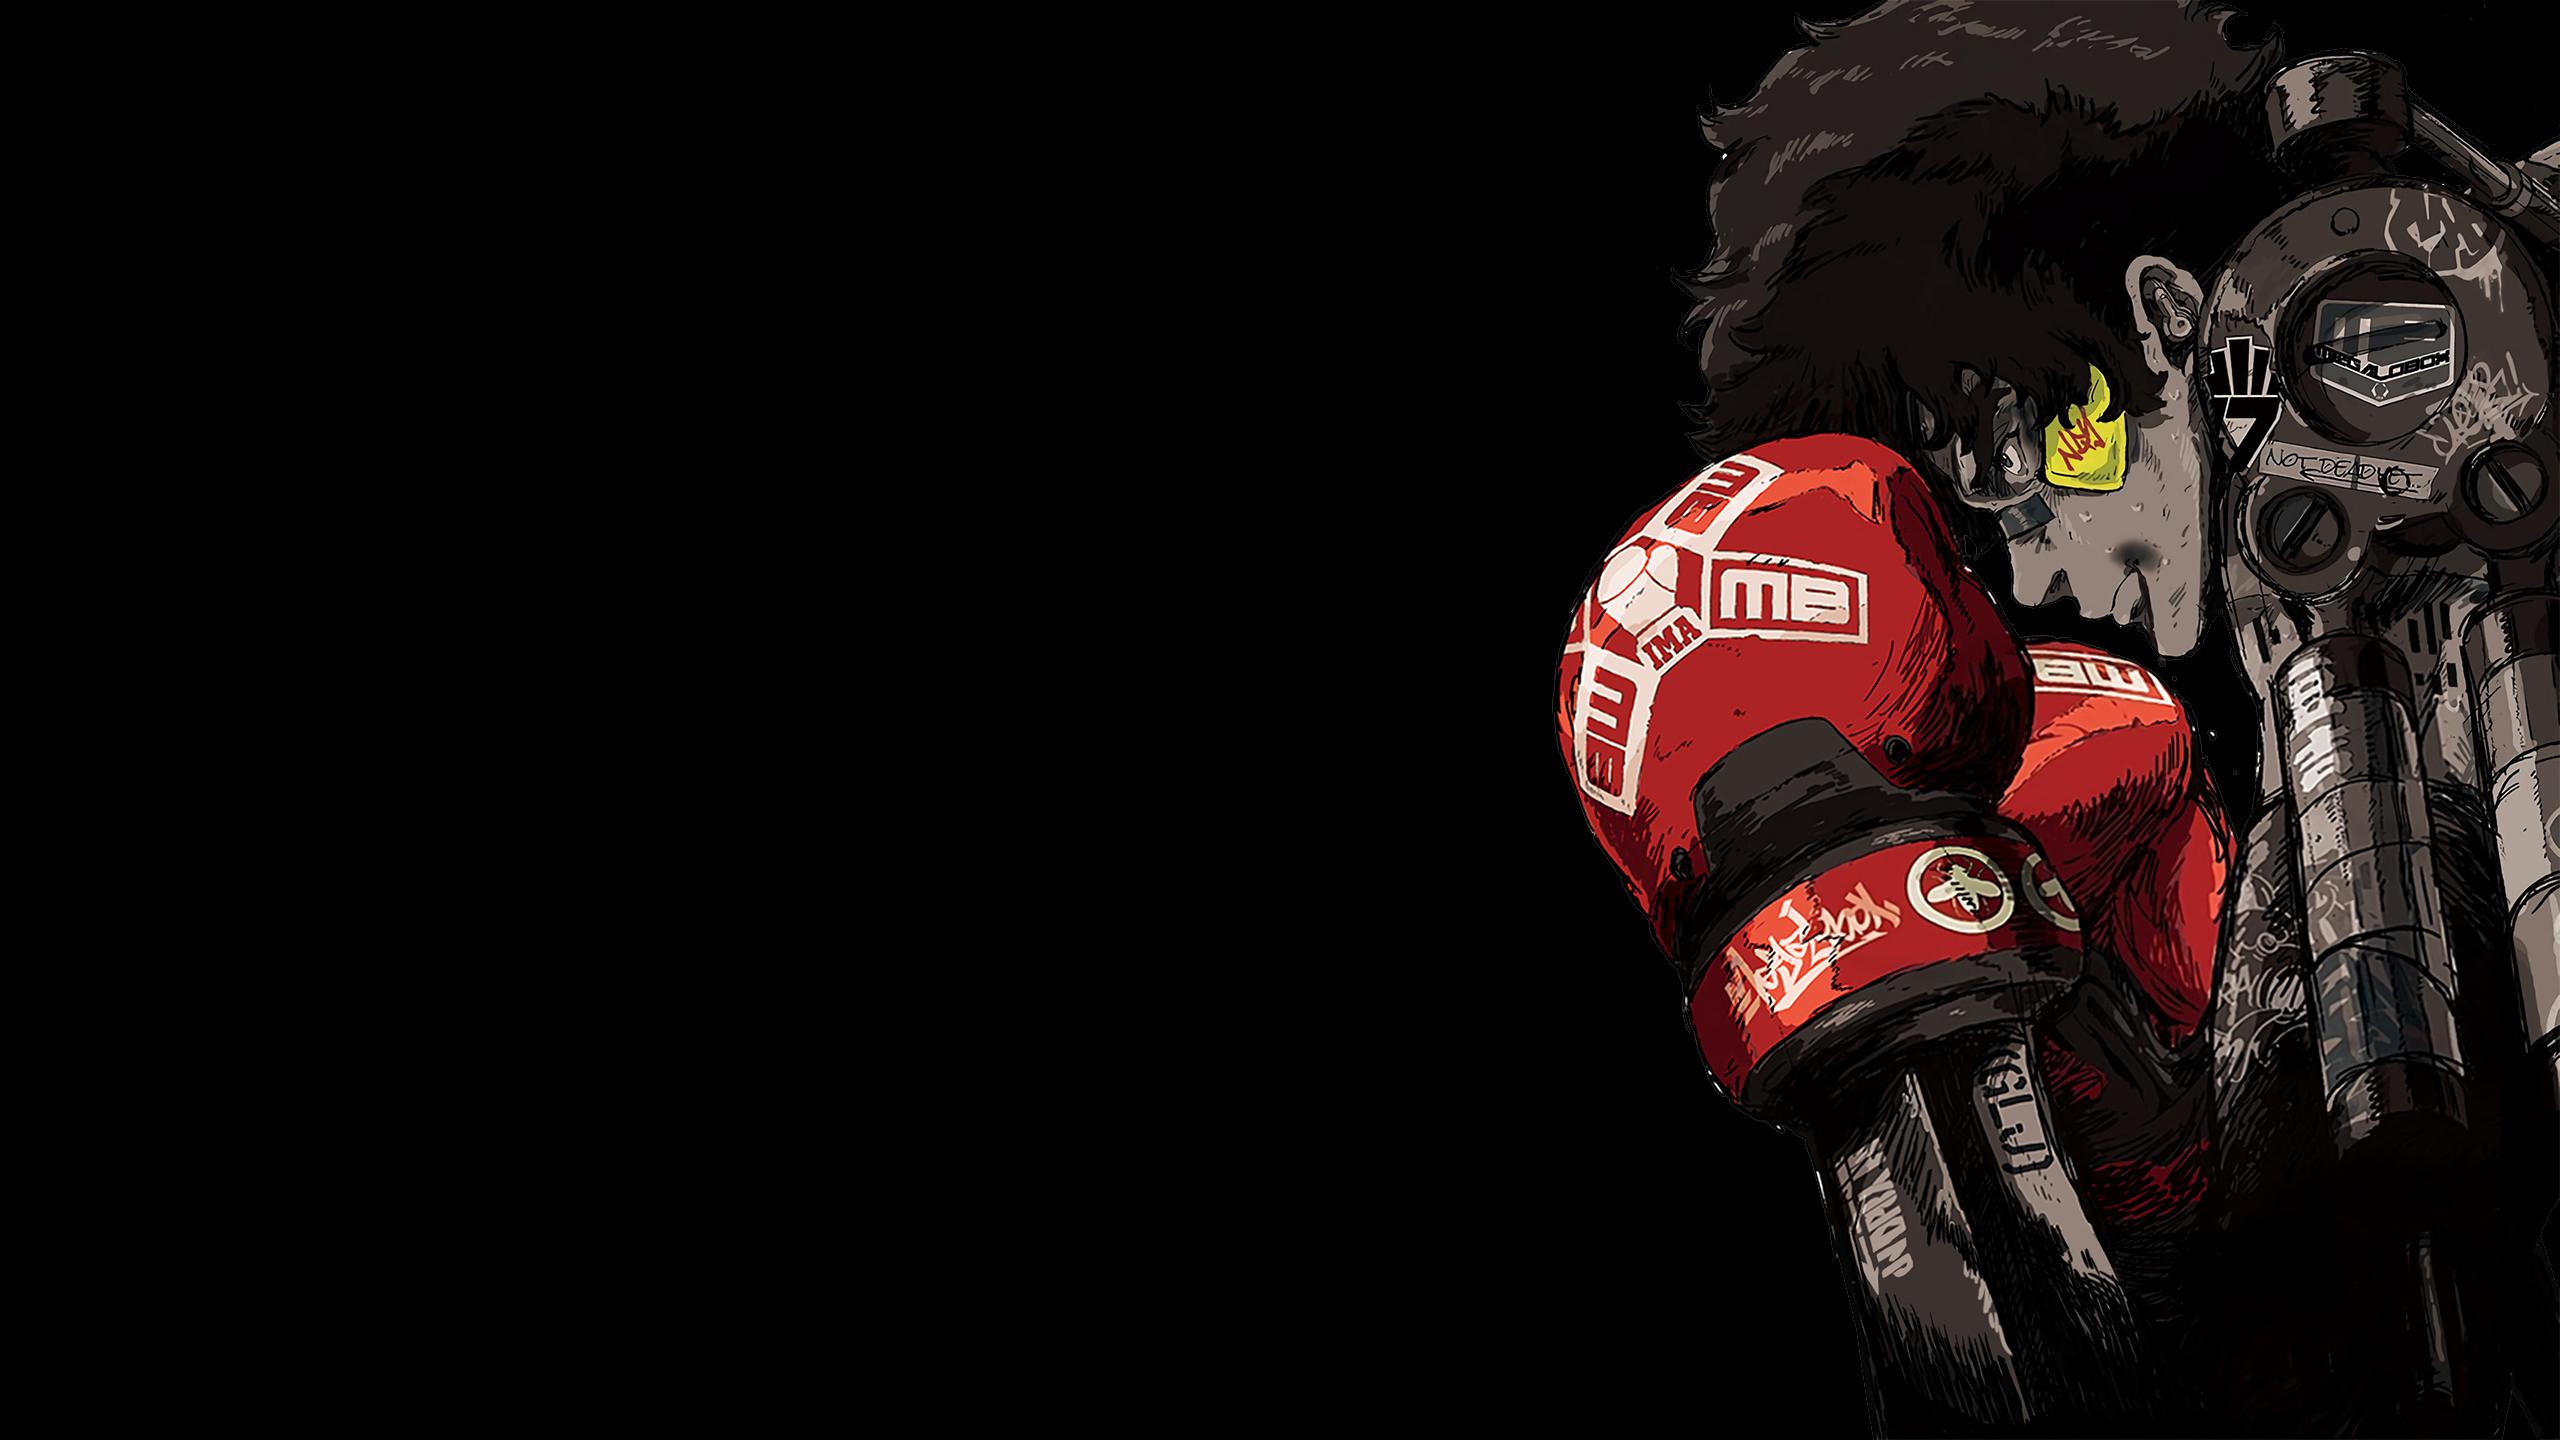 Wallpaper Digital Art Artwork Simple Background Boxing Gloves